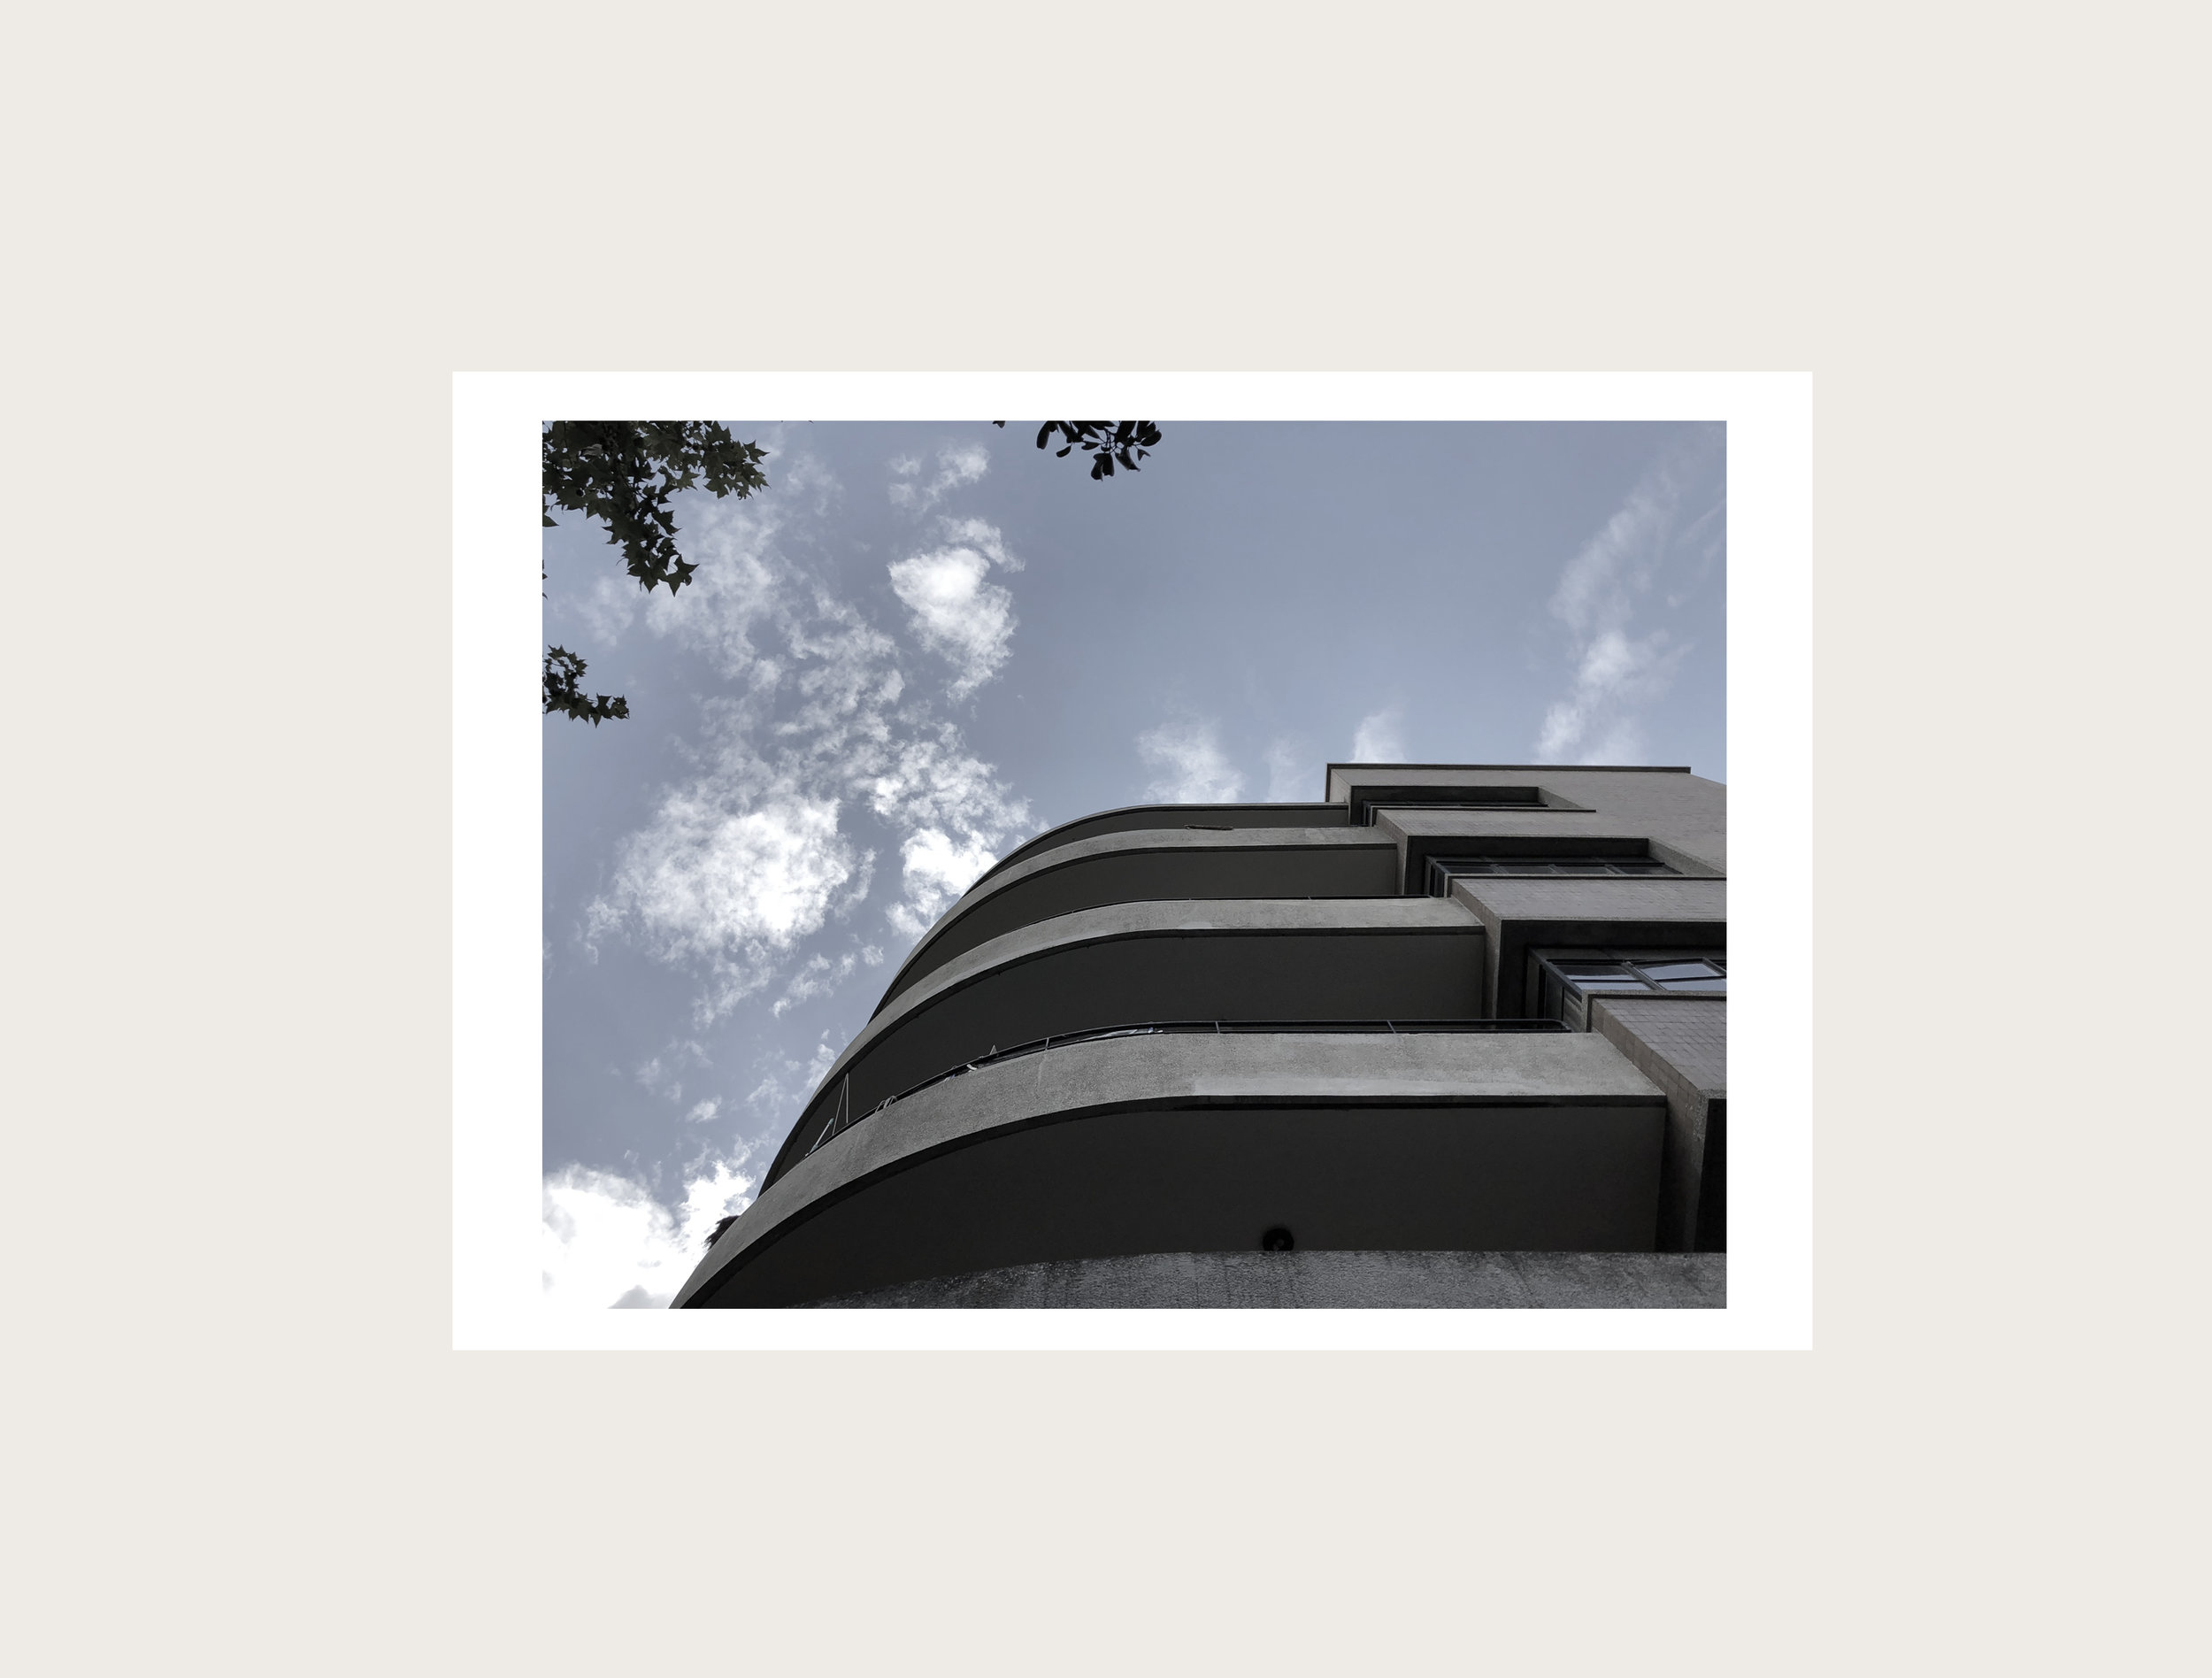 raams-architecture-design-studio-gascogne-apartment-house-shanghai-art-deco-china-04.jpg